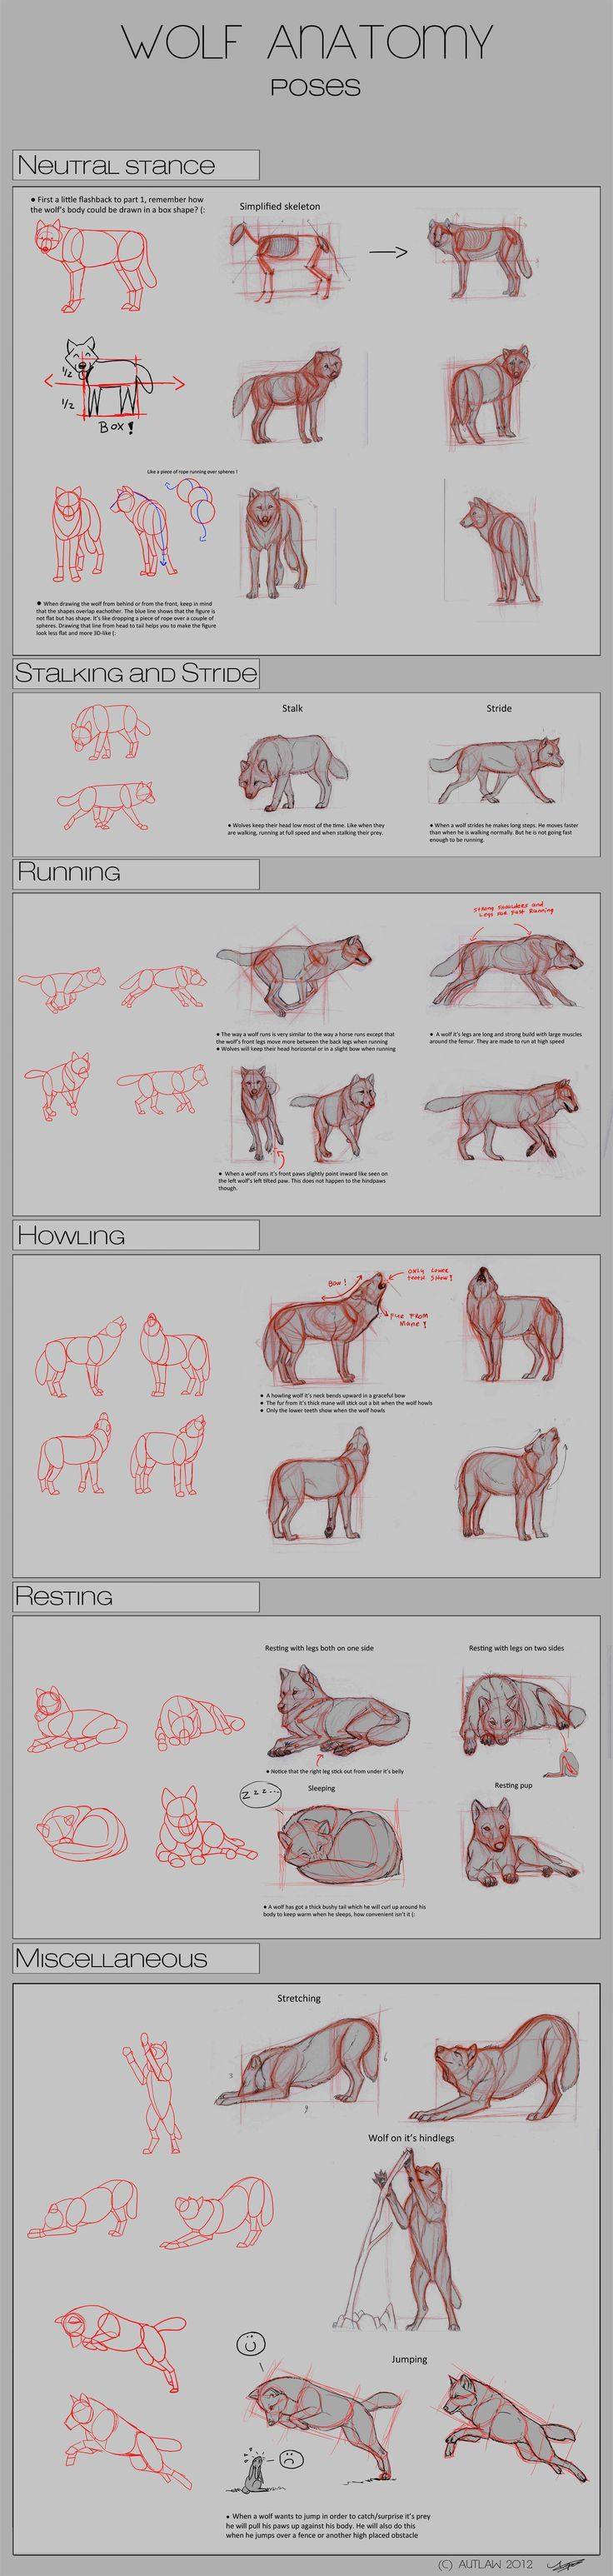 84 best skeltons images on Pinterest | Animal anatomy, Animal ...